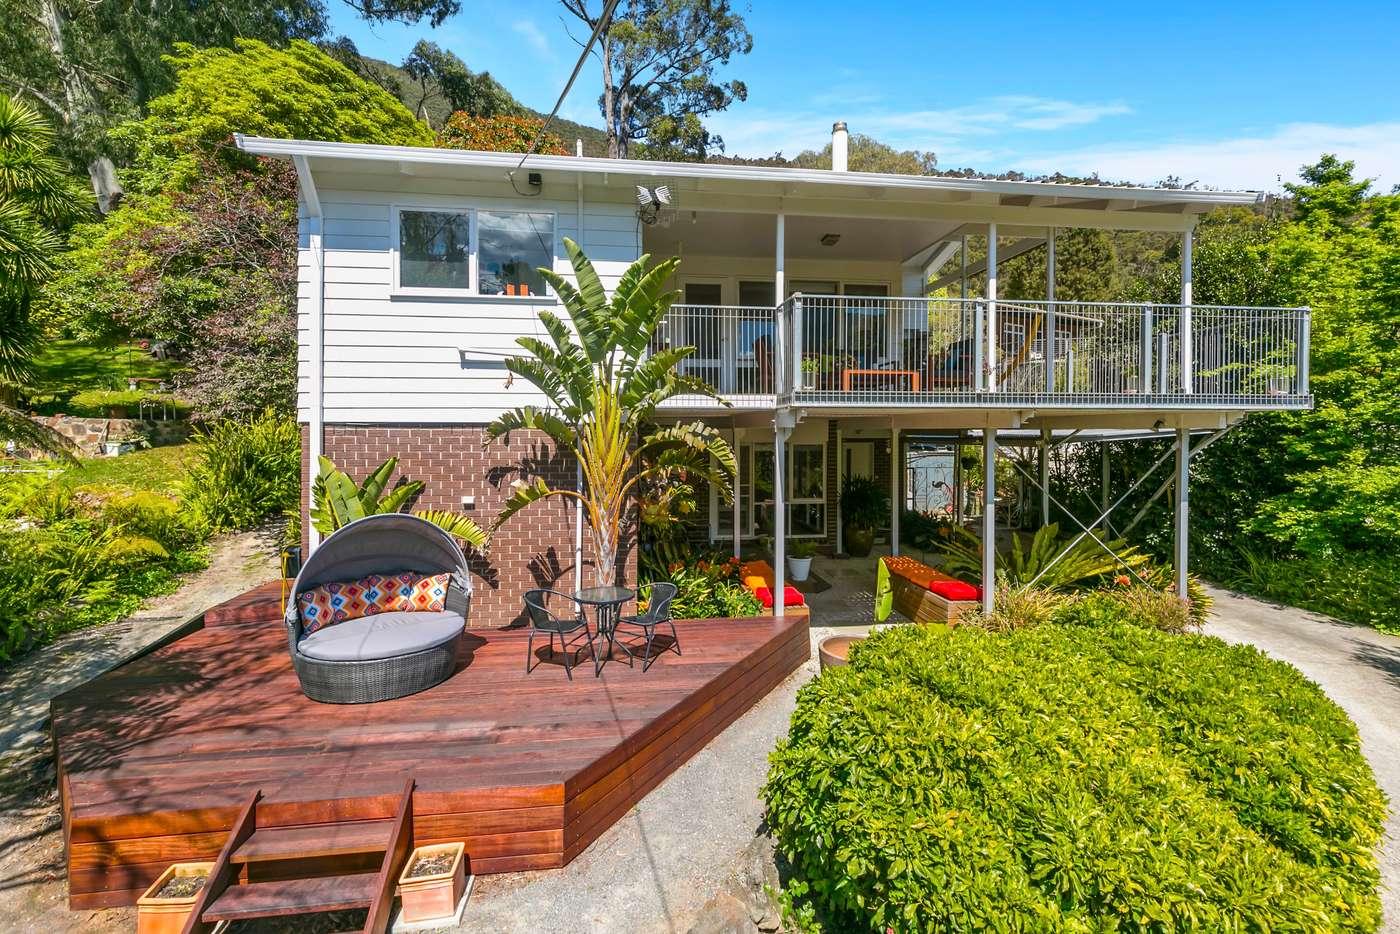 Main view of Homely house listing, 4 Mildura Avenue, Warburton VIC 3799